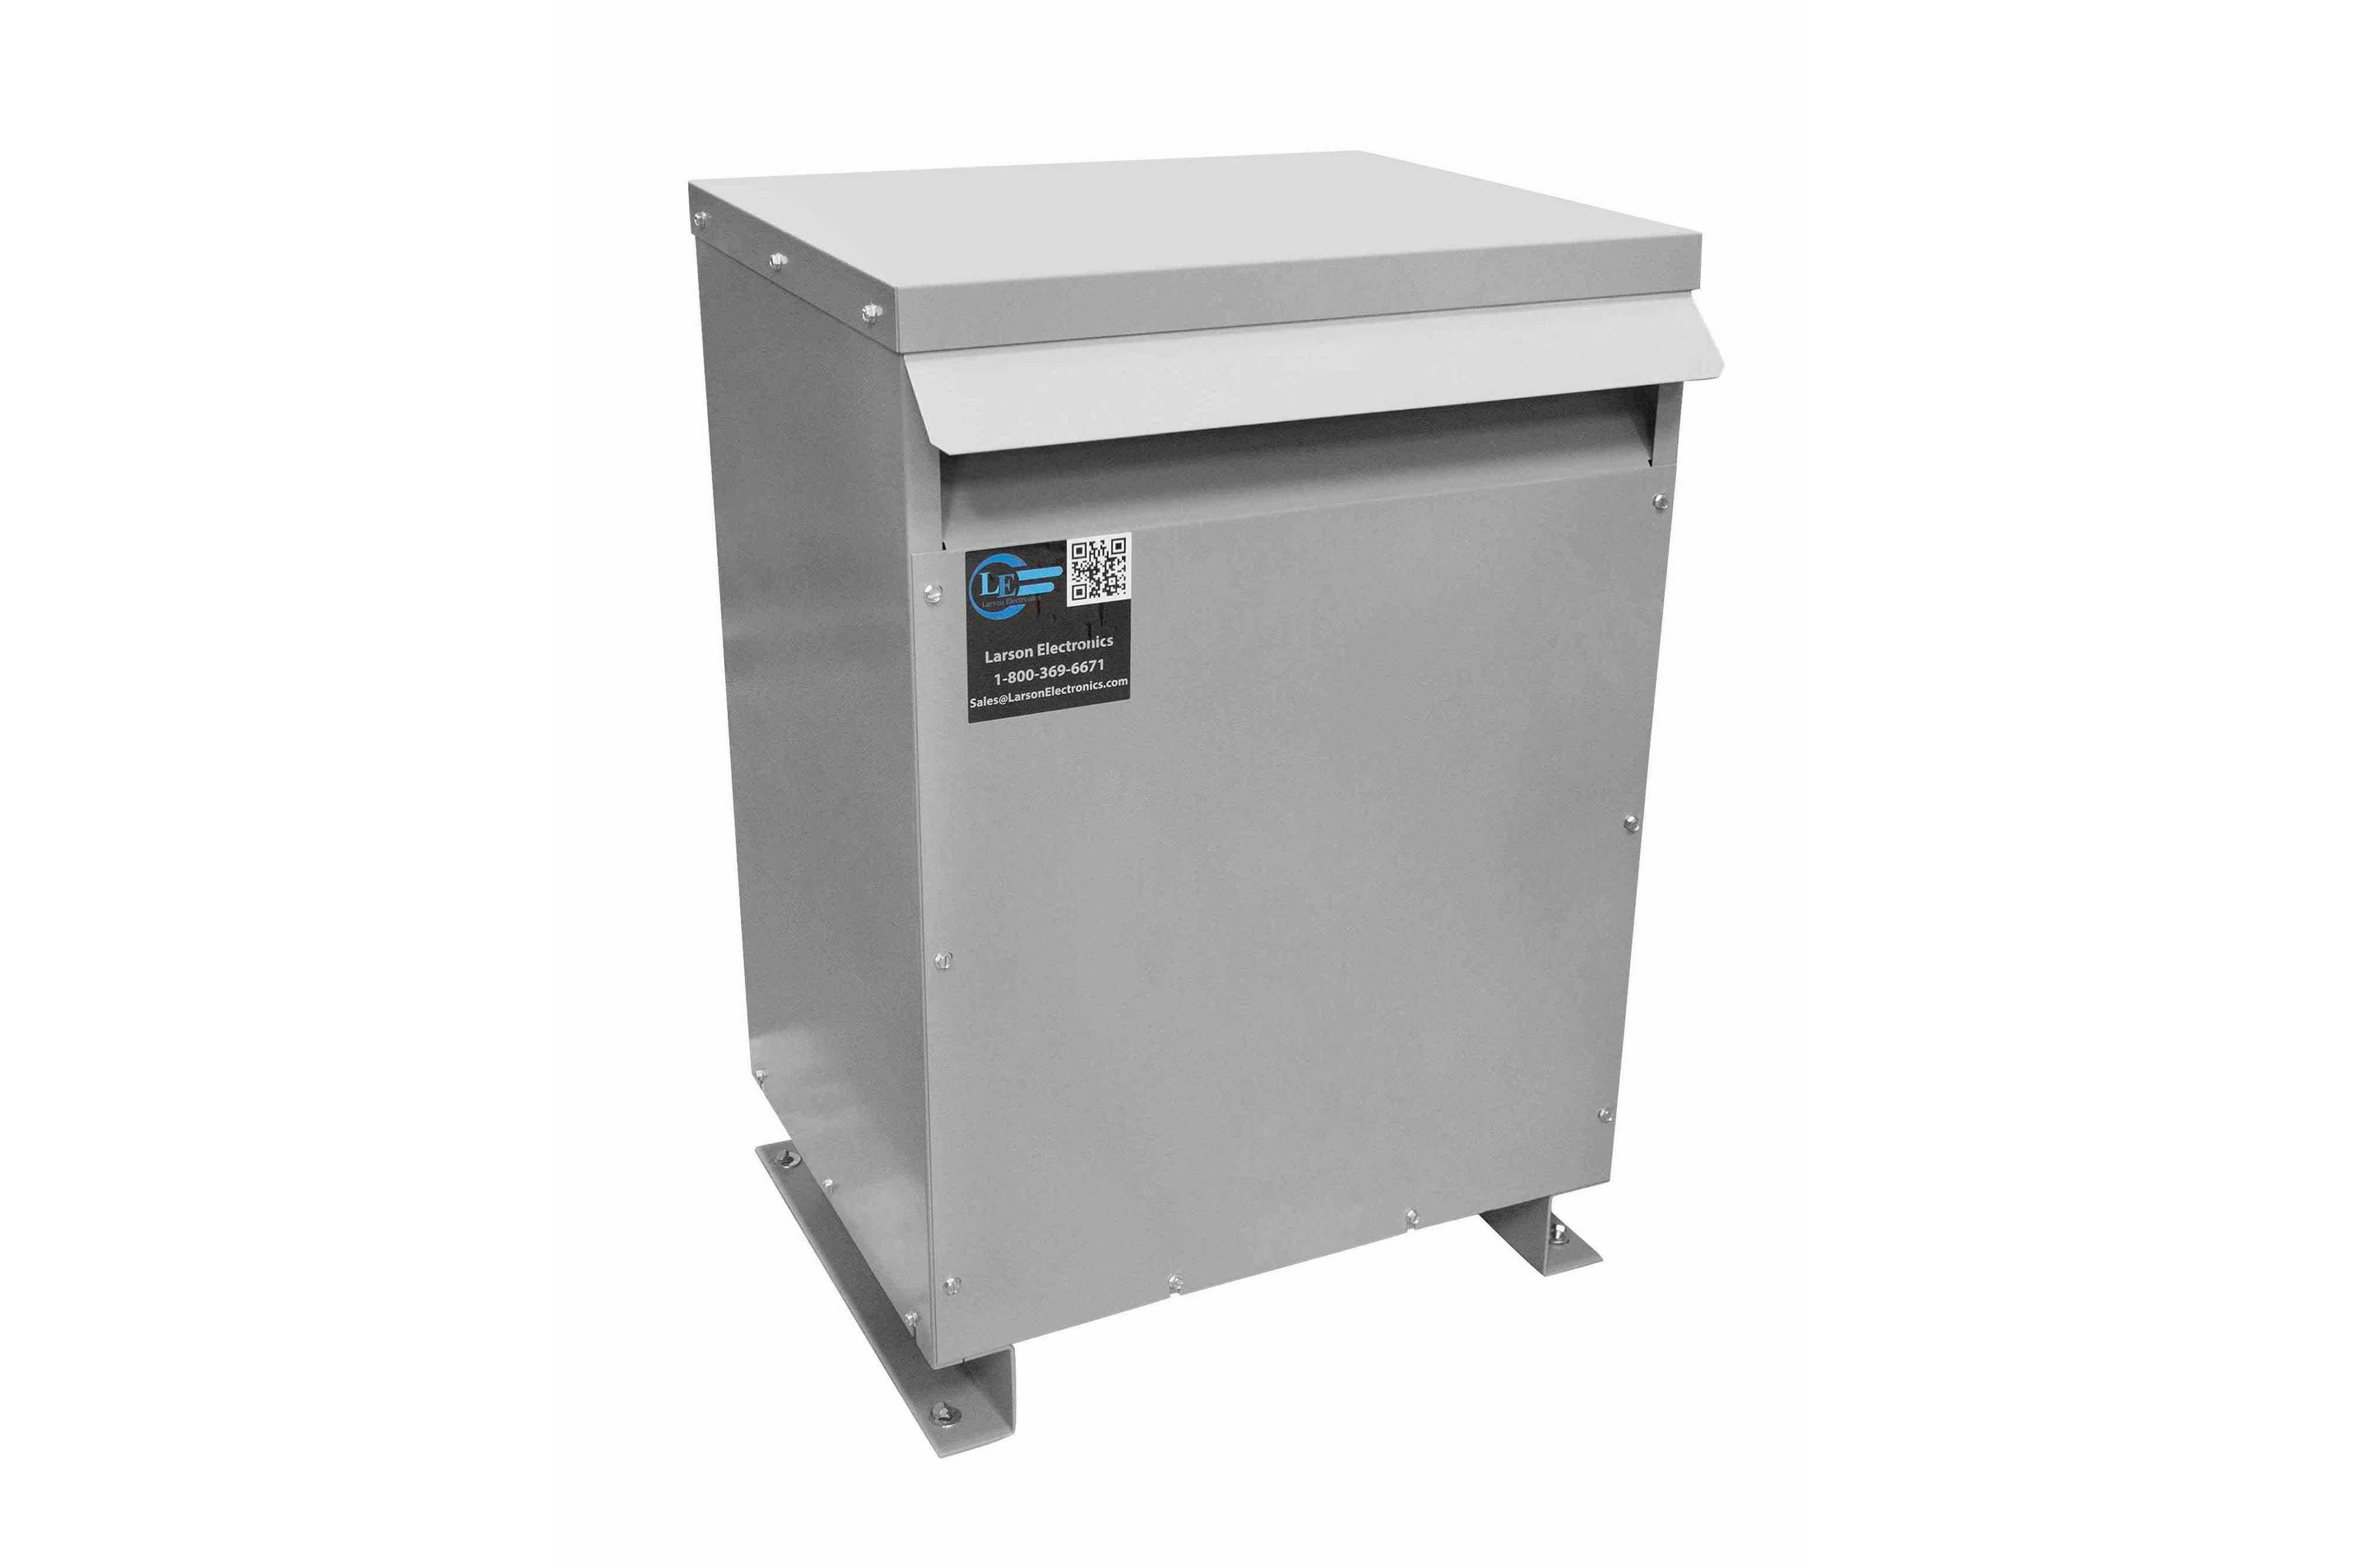 150 kVA 3PH DOE Transformer, 230V Delta Primary, 208Y/120 Wye-N Secondary, N3R, Ventilated, 60 Hz